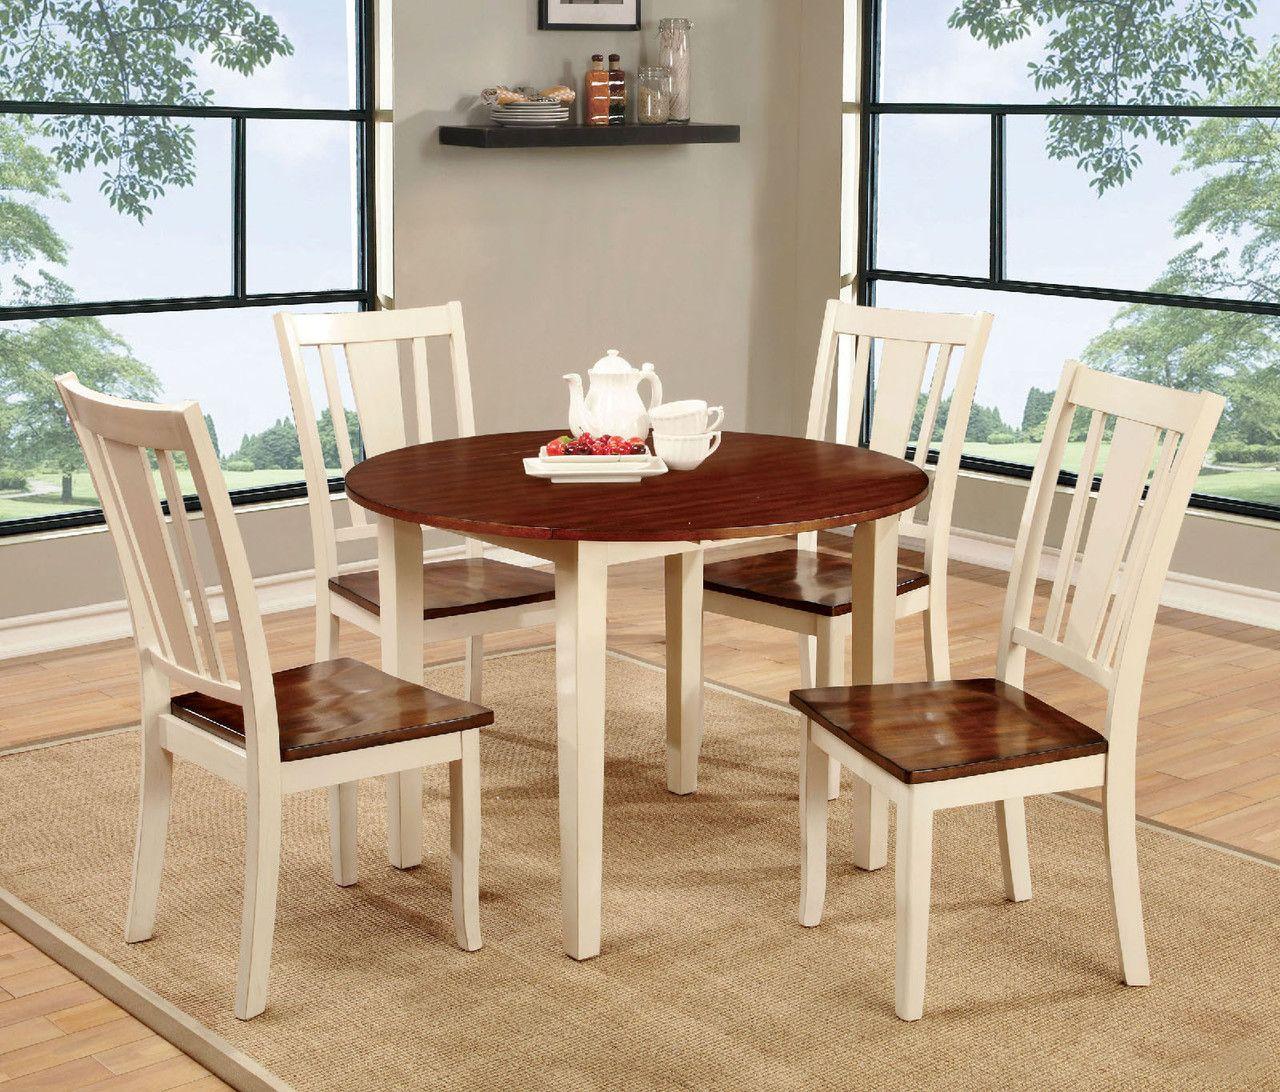 Furniture of america dover pcs vintage white u cherry round dining